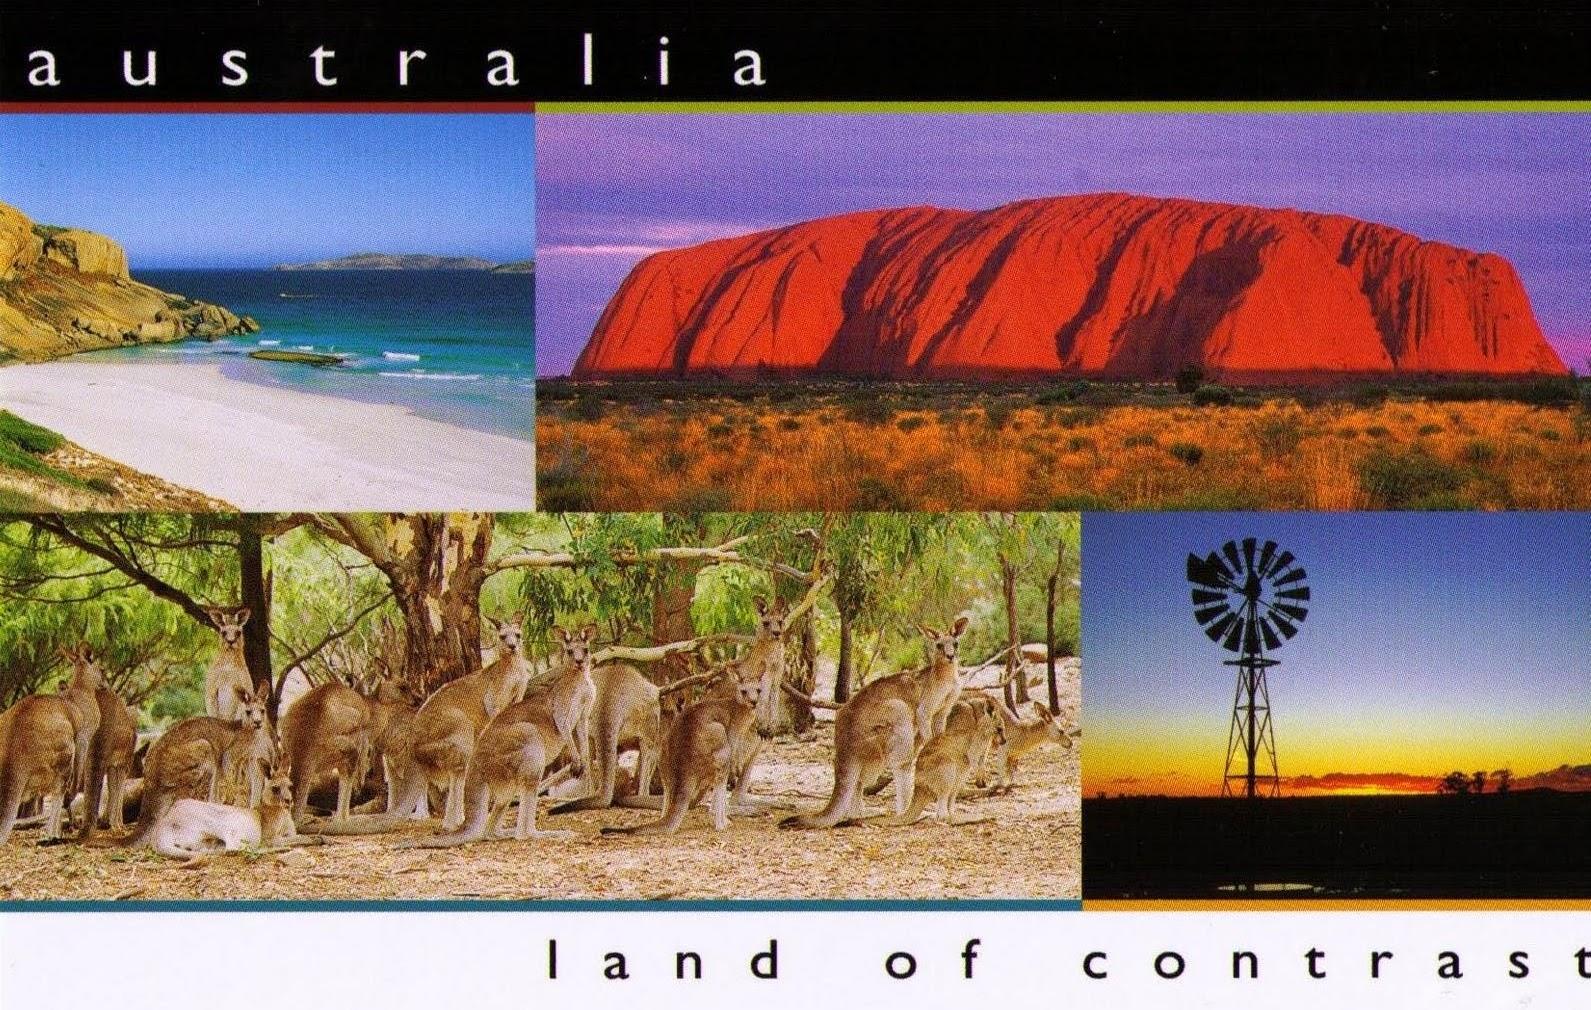 Австралия страна контрастов